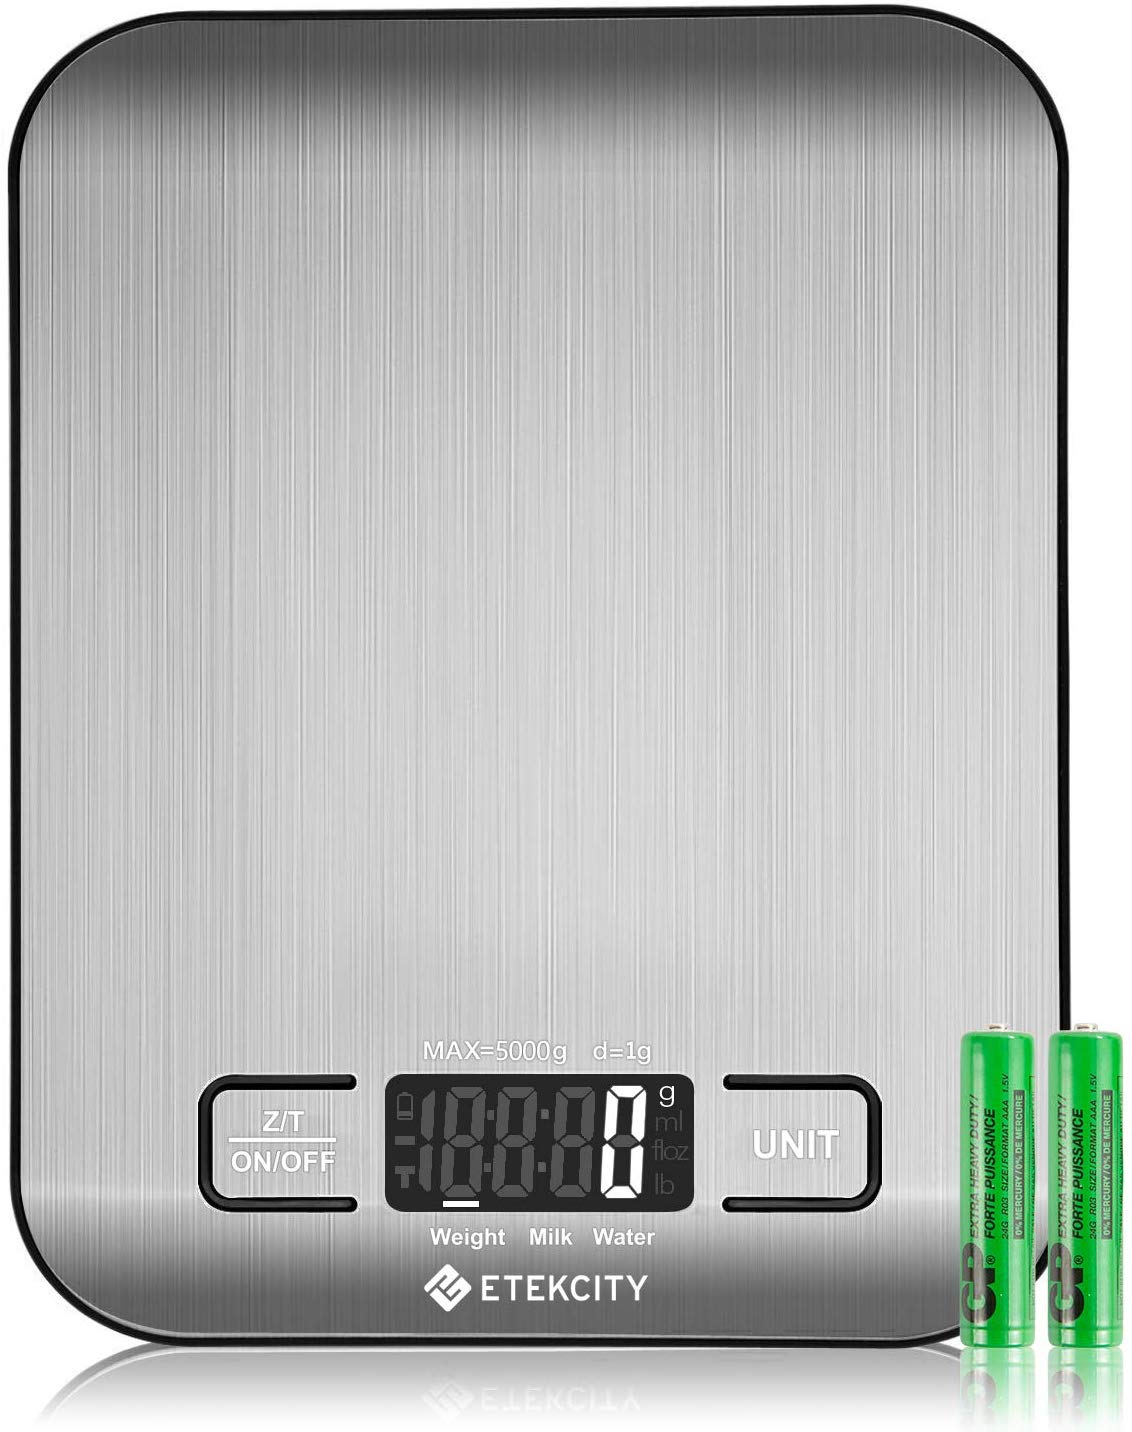 Etekcity digital multifunction stainless steel kitchen food scale